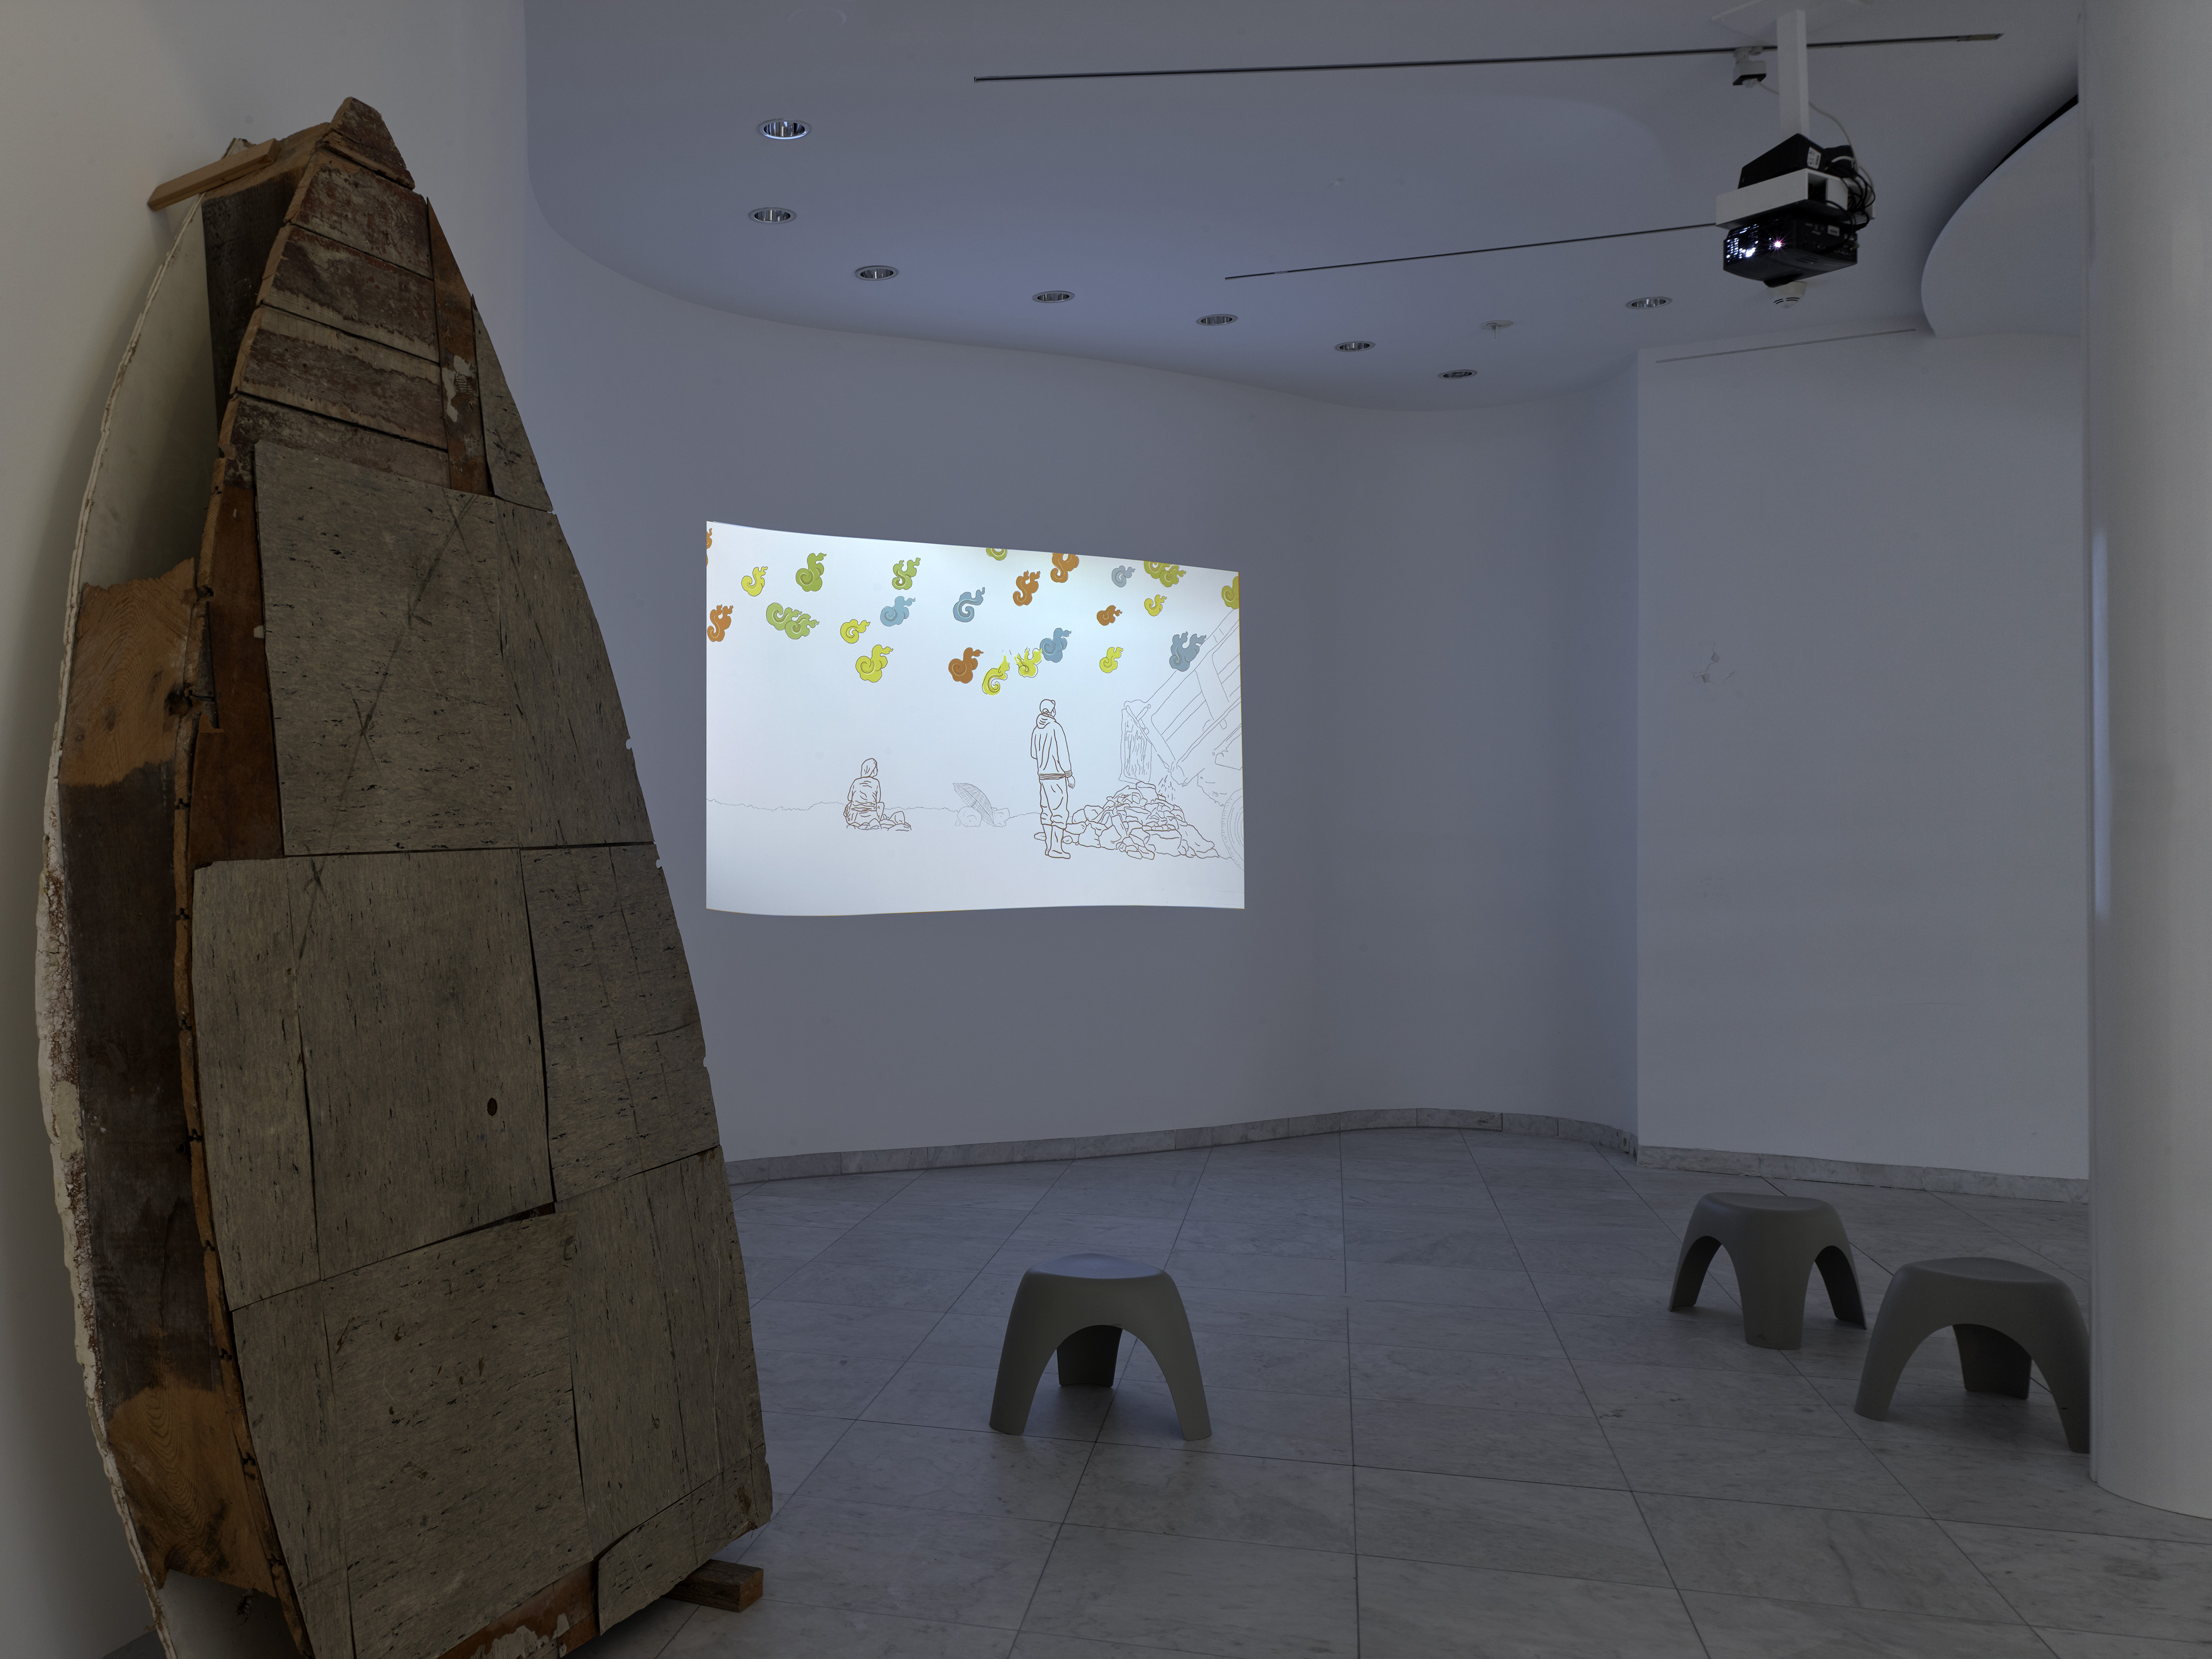 Lin+Lam, Three Missing Letters, 2020; Gordon Matta-Clark, Office Baroque, Antwerp project, 1977